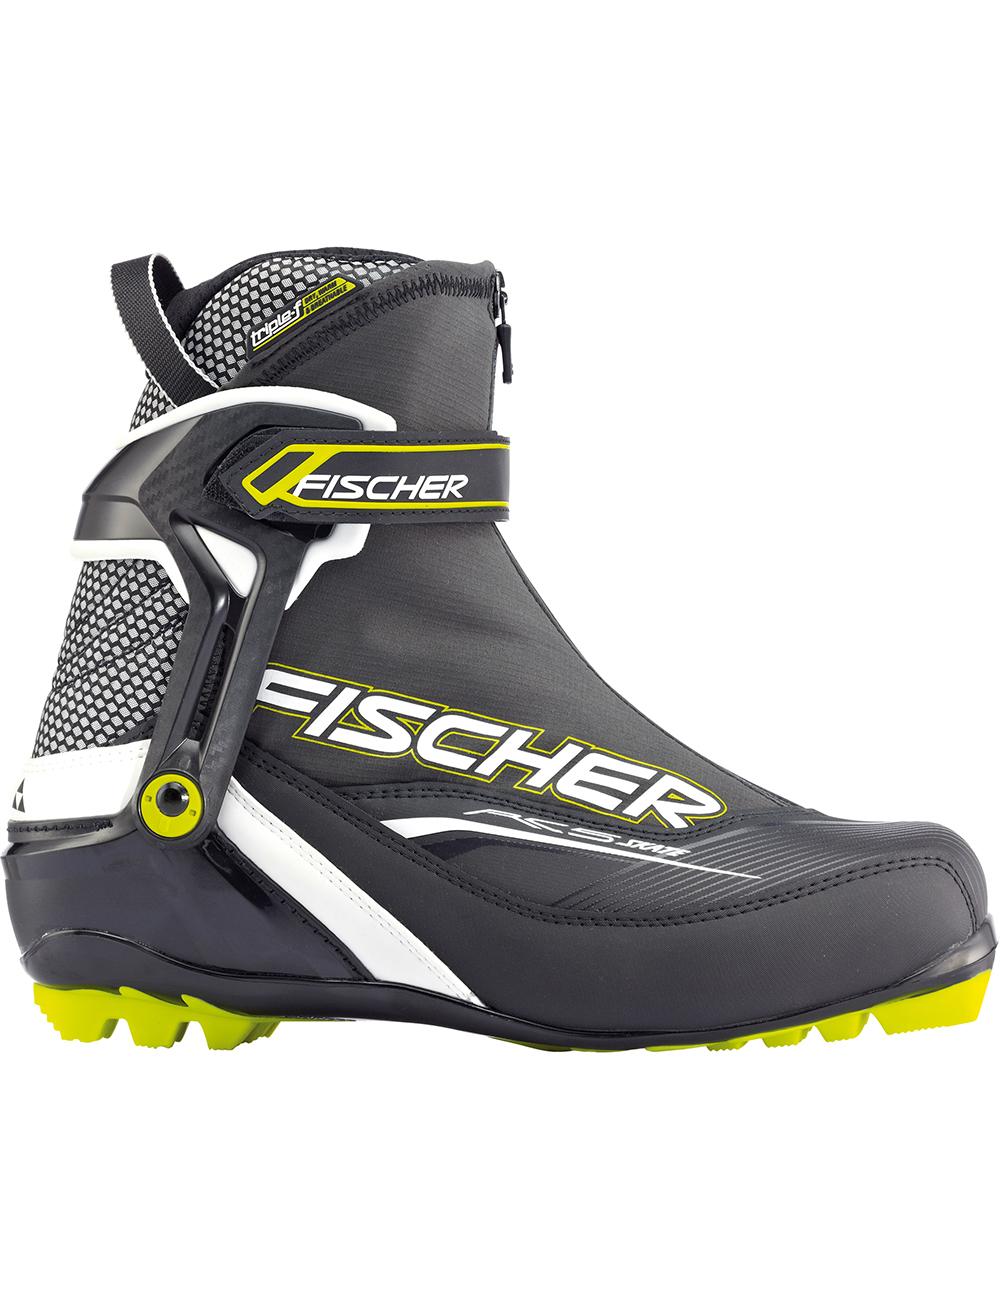 FISCHER Лыжные ботинки RC5 SKATING, артикул S00813 -, характеристики ... 2166fc2dfa9